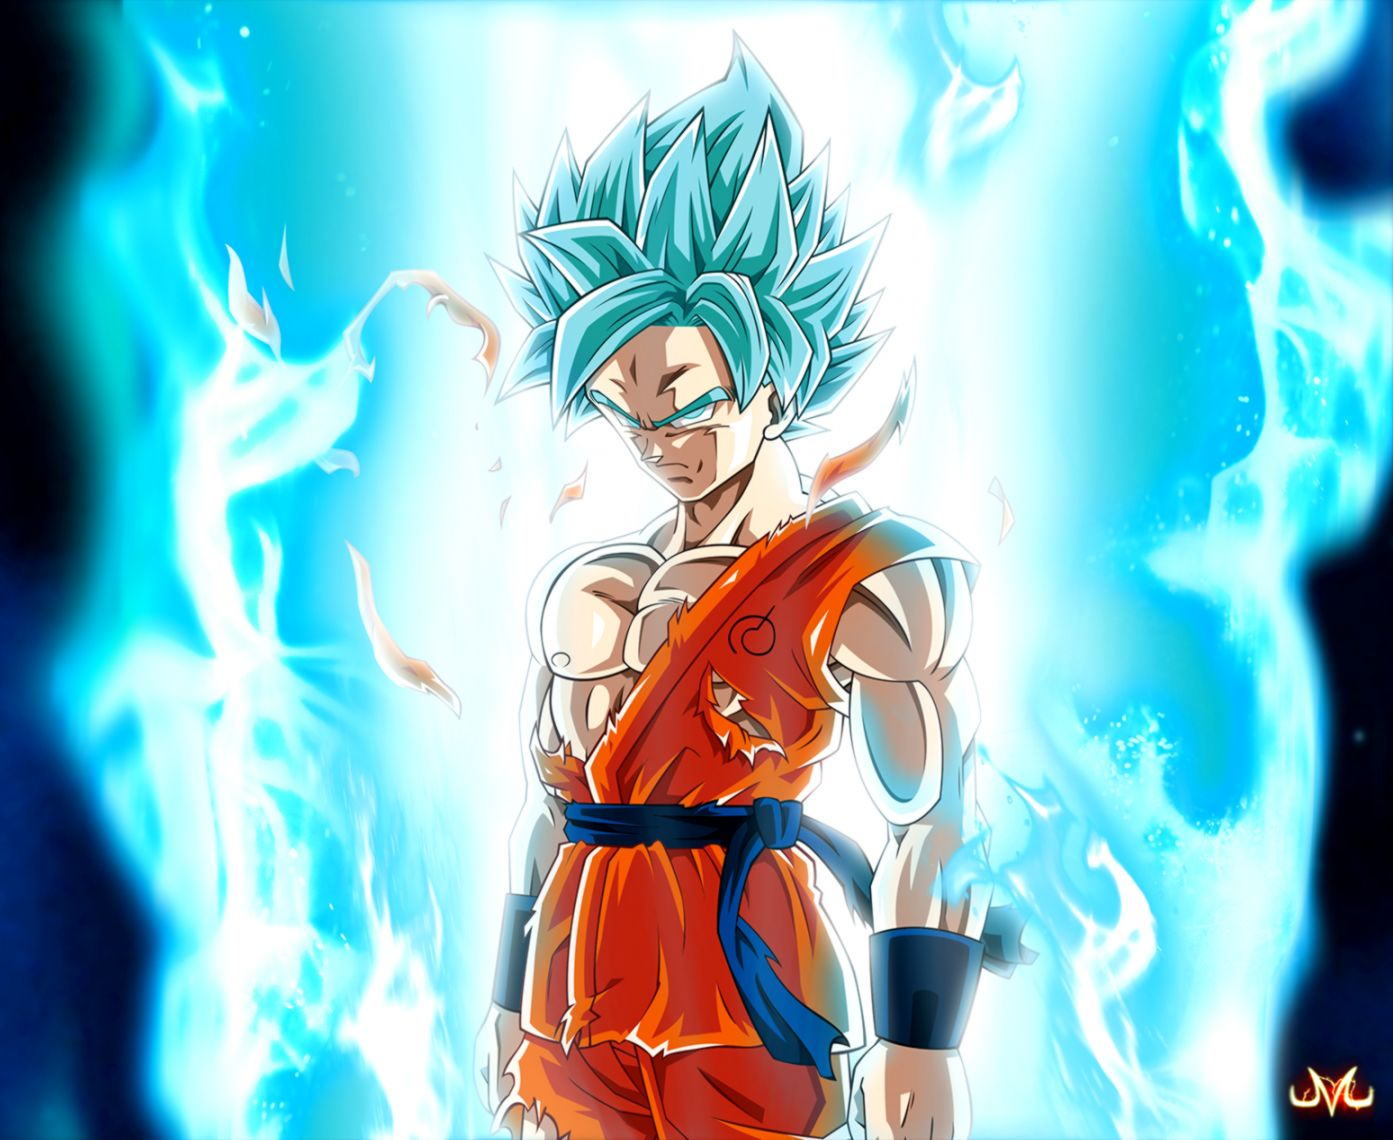 Super Saiyan God Super Saiyan Goku Wallpapers Posted By John Johnson